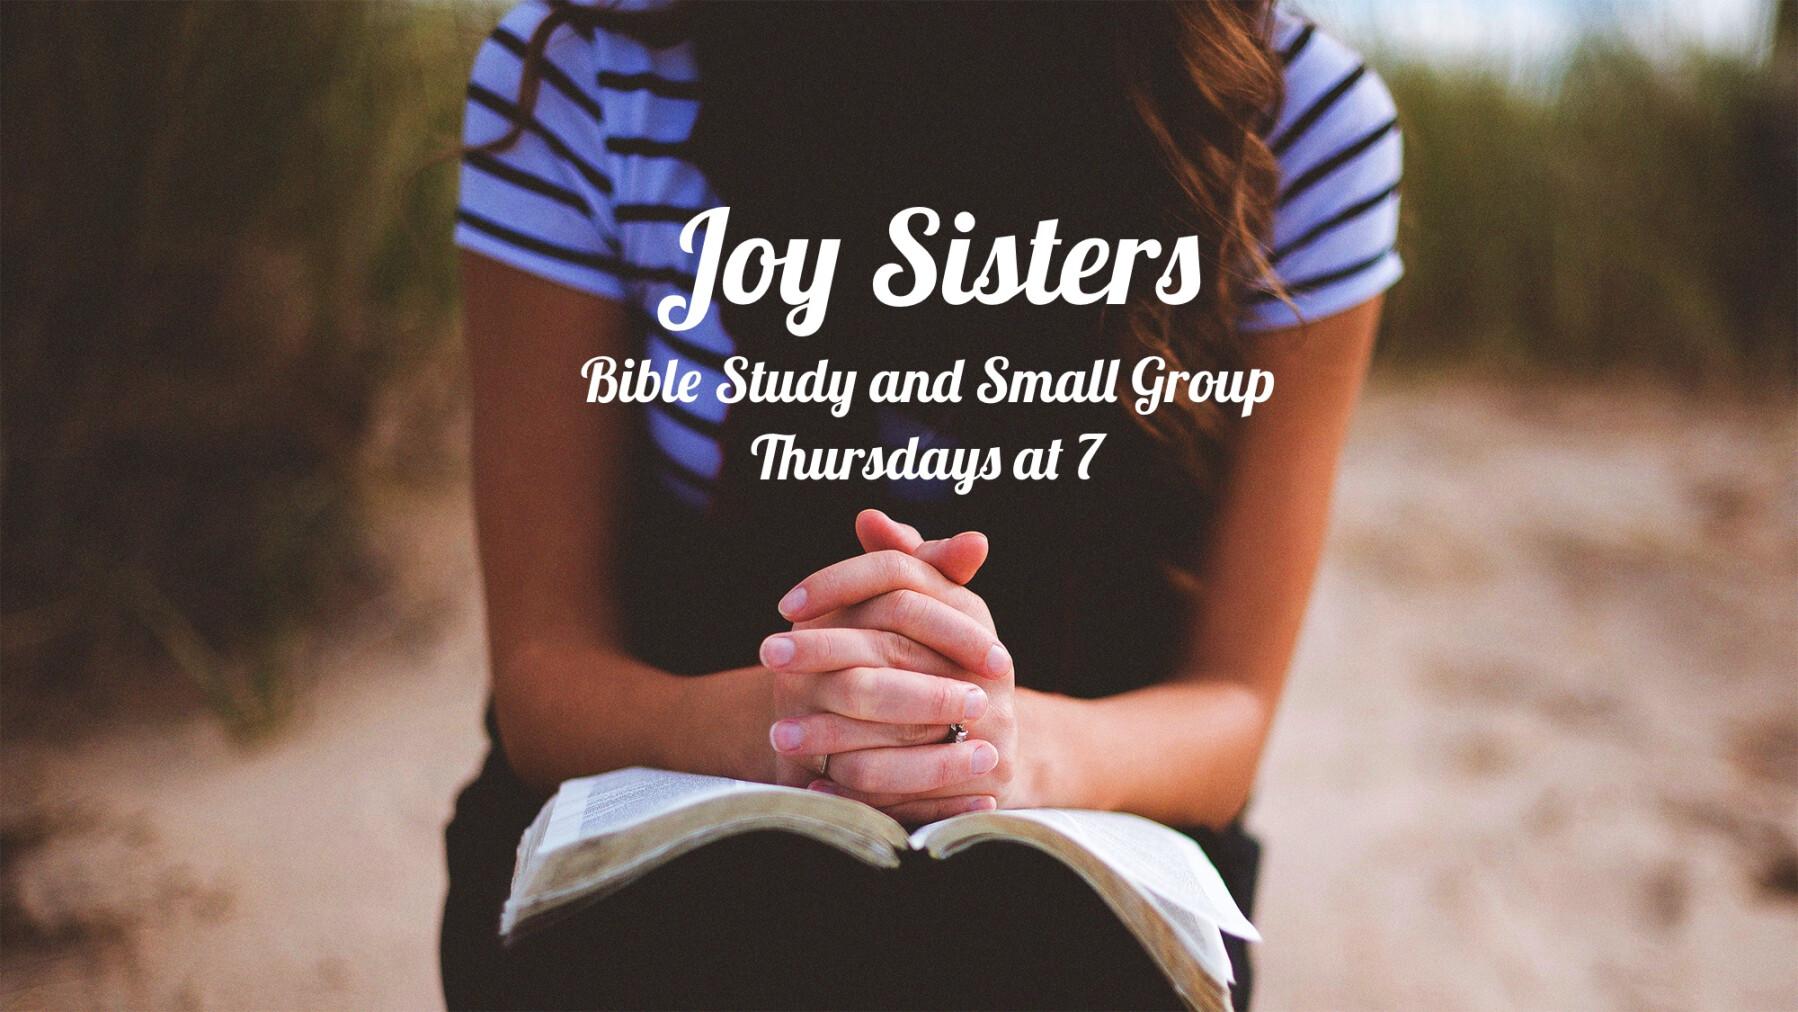 Joy Sisters Bible Study and Small Group